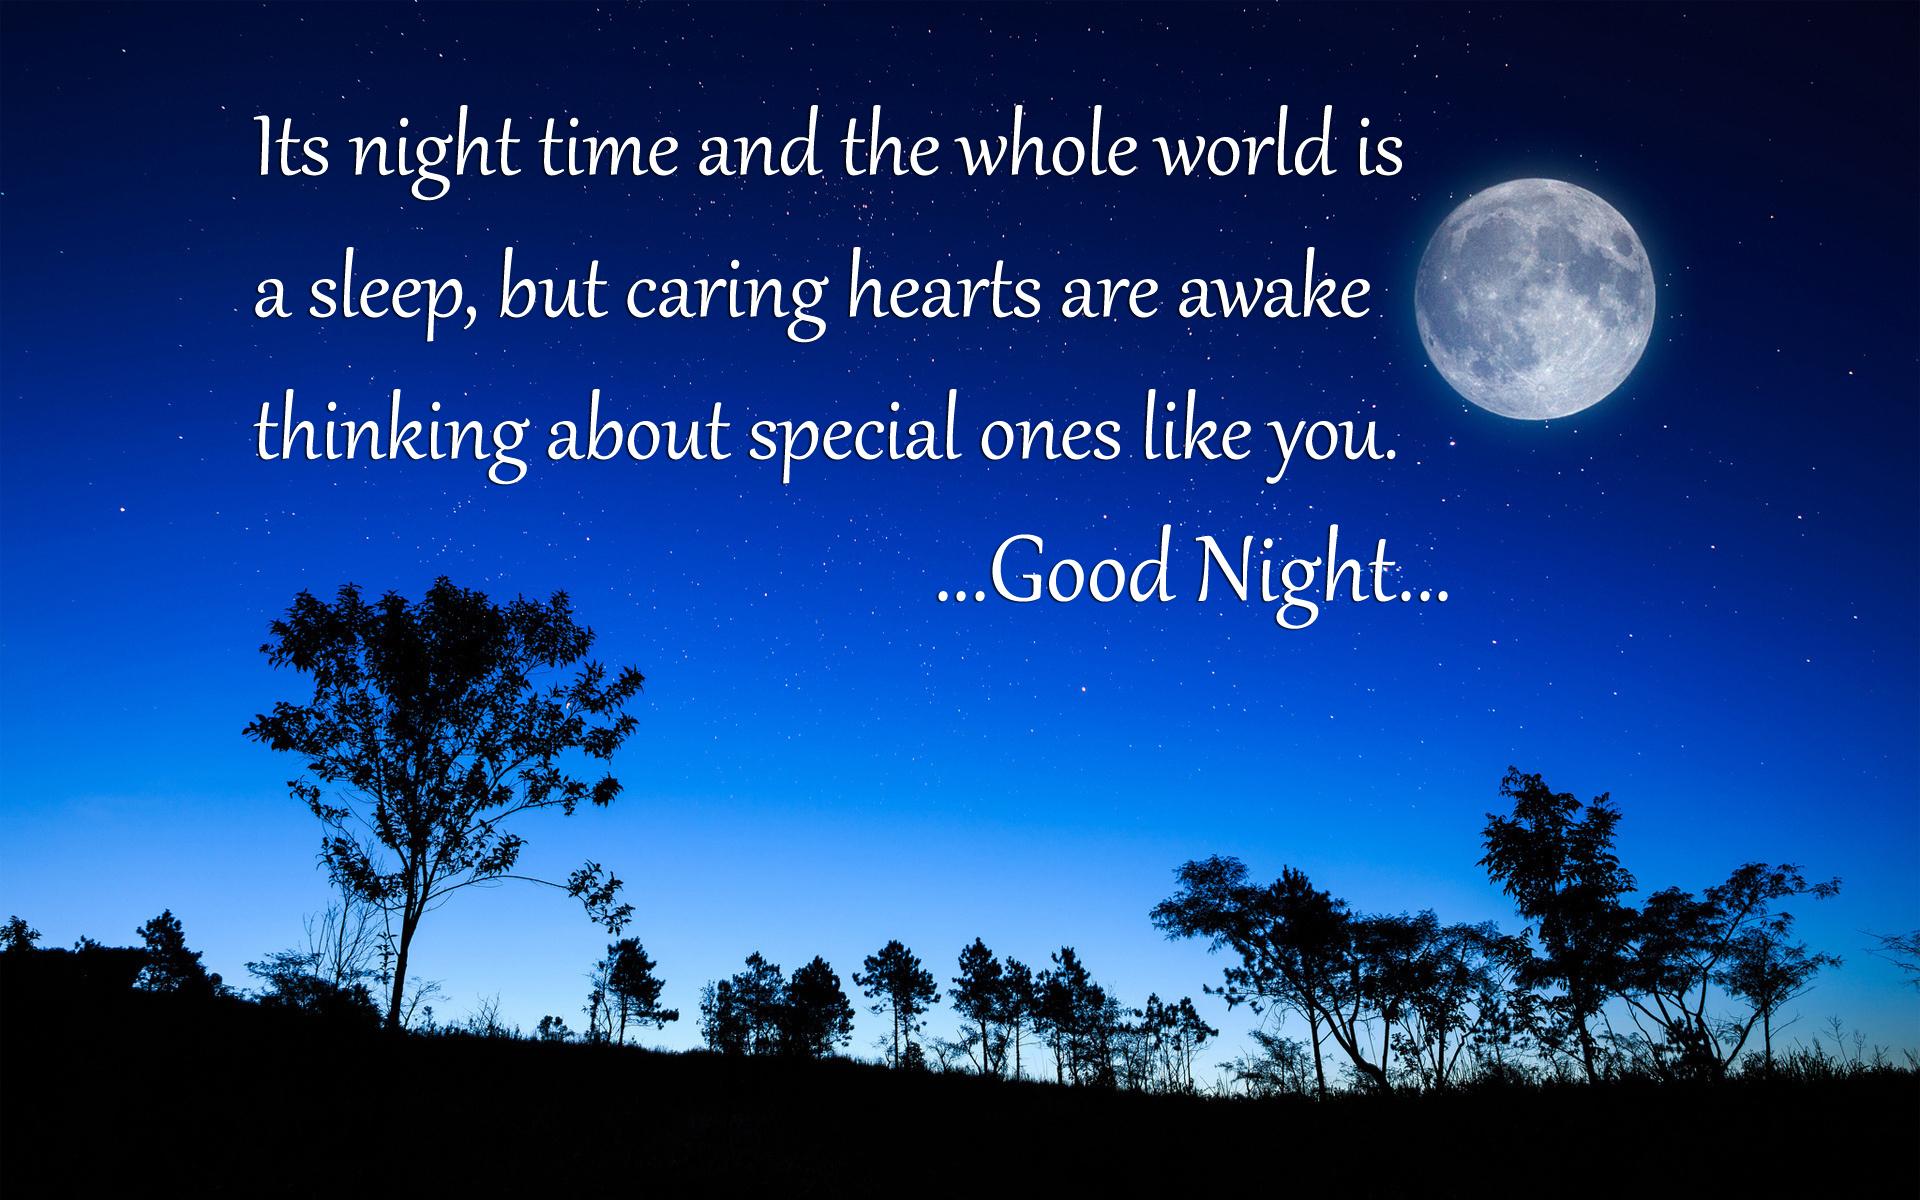 Beautiful good night quote hd wallpapers hd wallpapers thoughts and quotes wallpapers previous wallpaper beautiful good night voltagebd Gallery